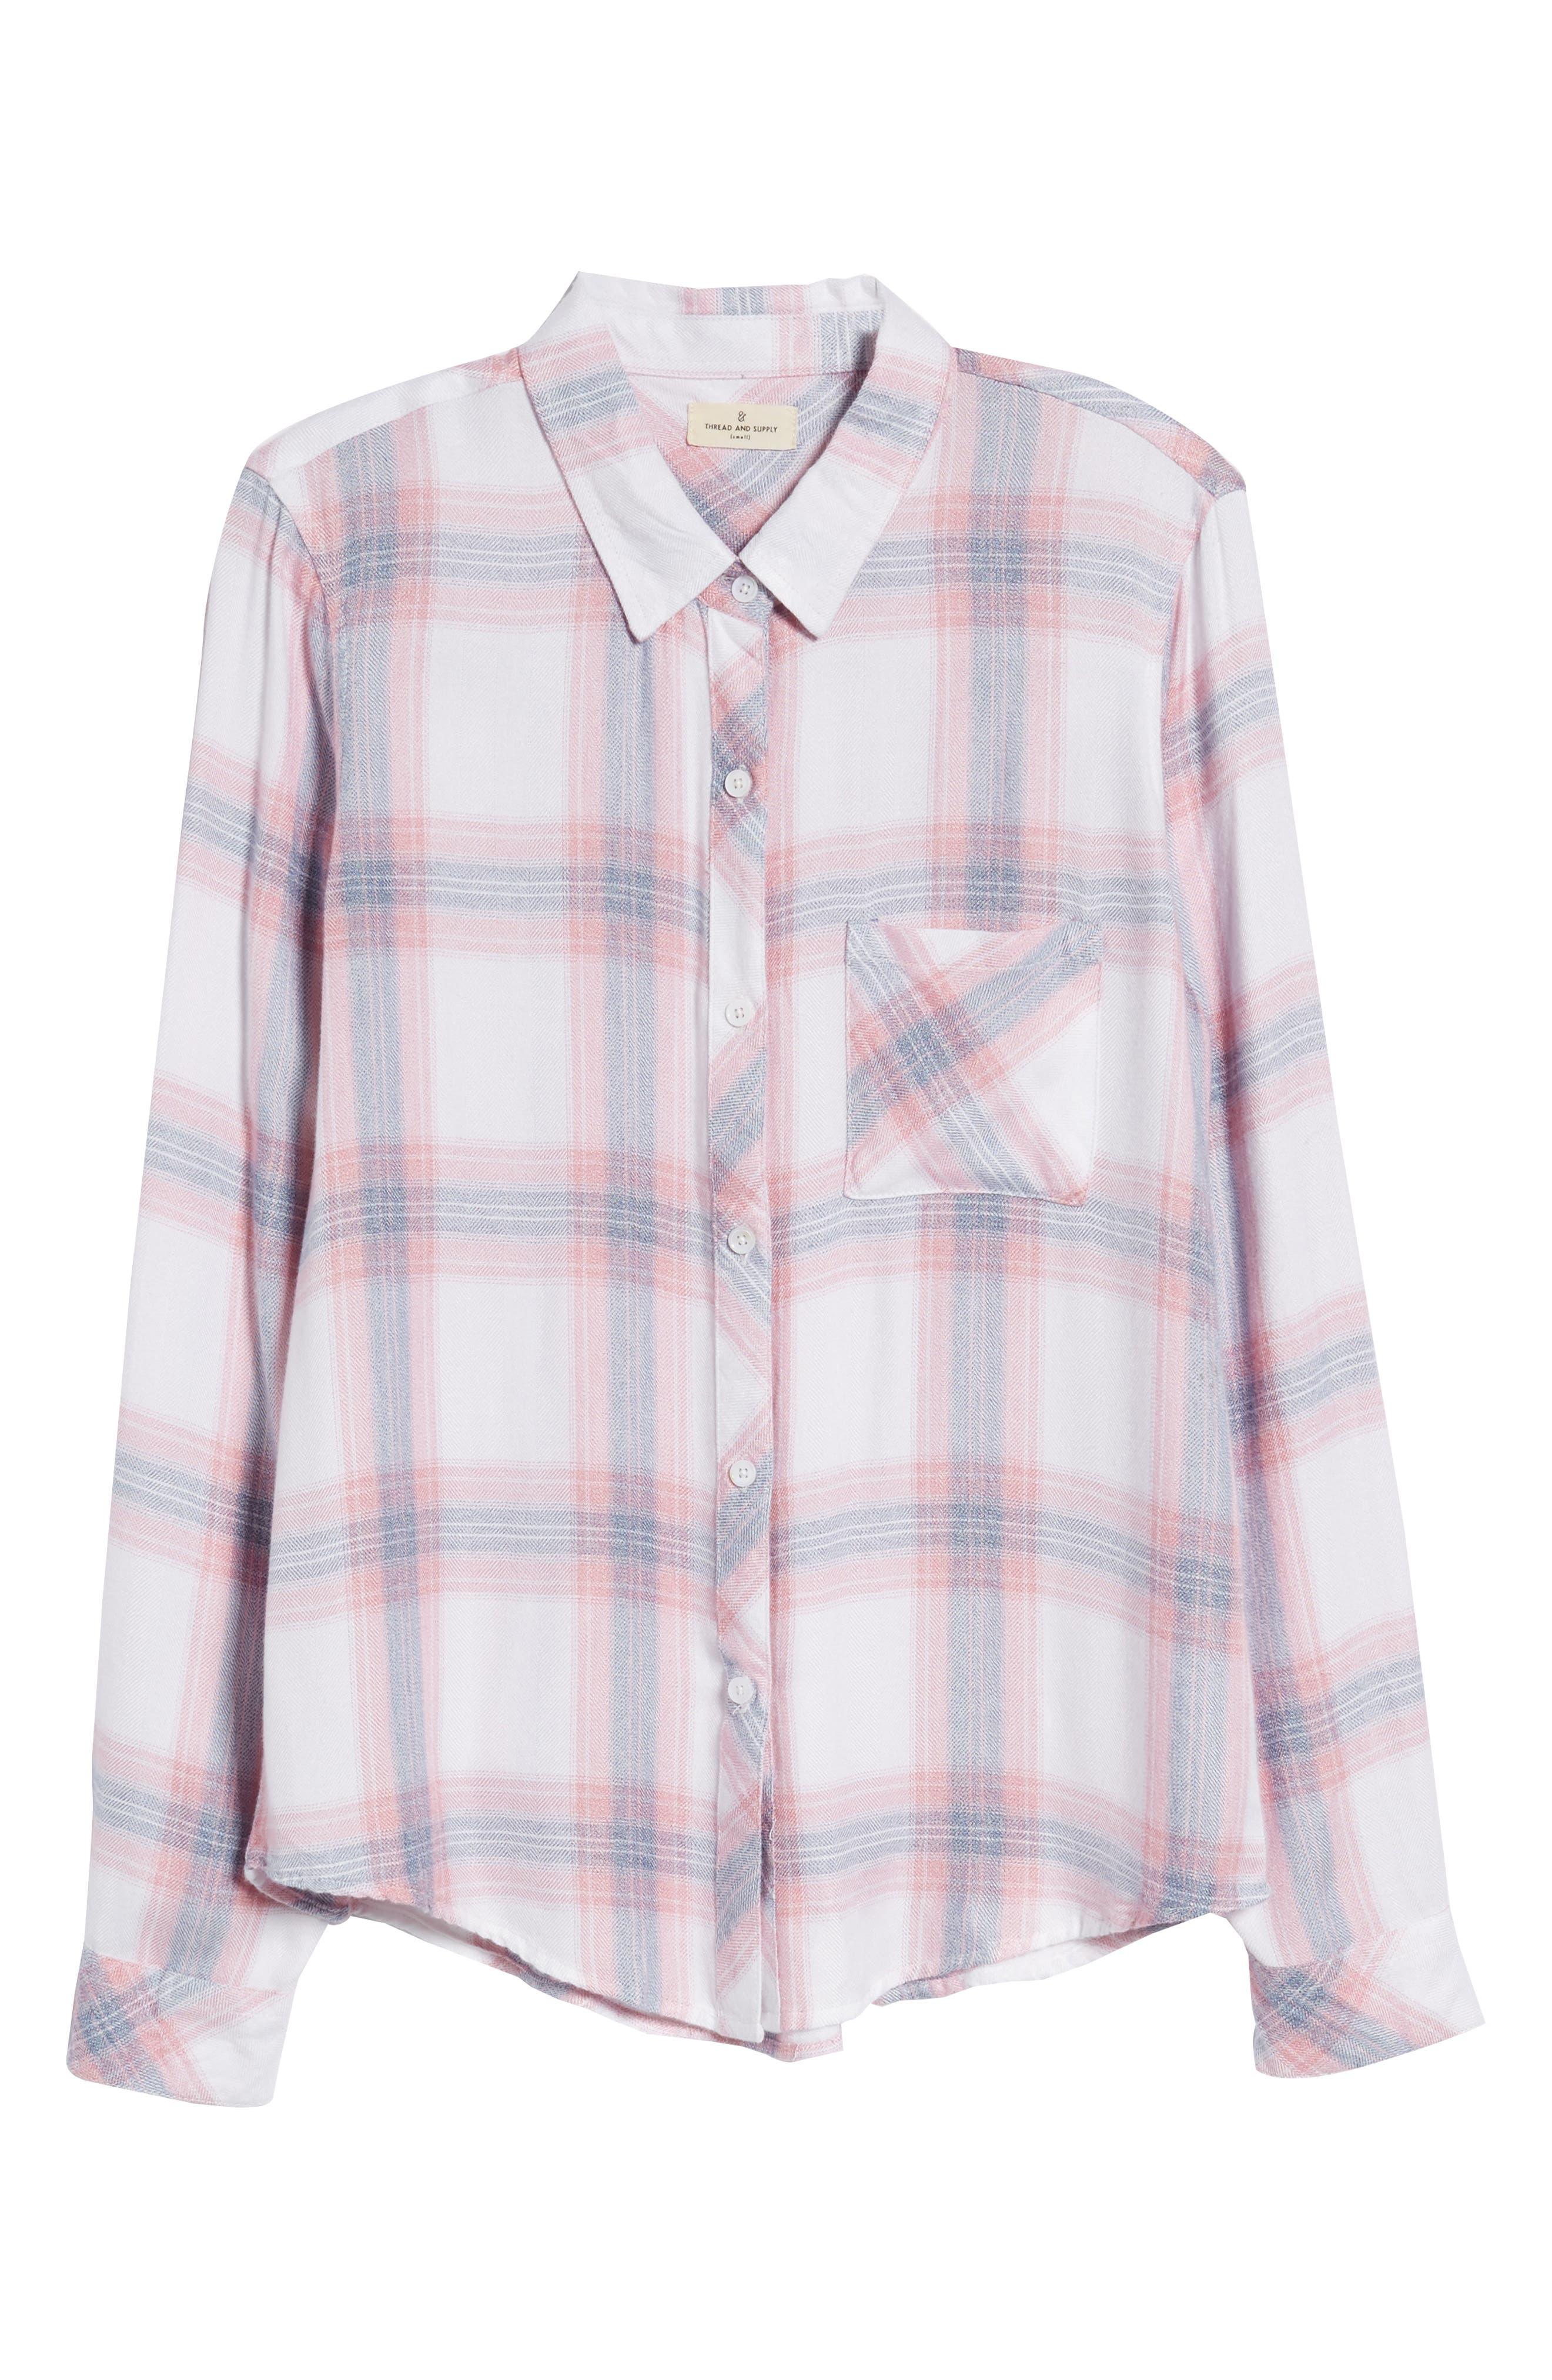 Carina Plaid Shirt,                             Alternate thumbnail 7, color,                             Red/ White Plaid